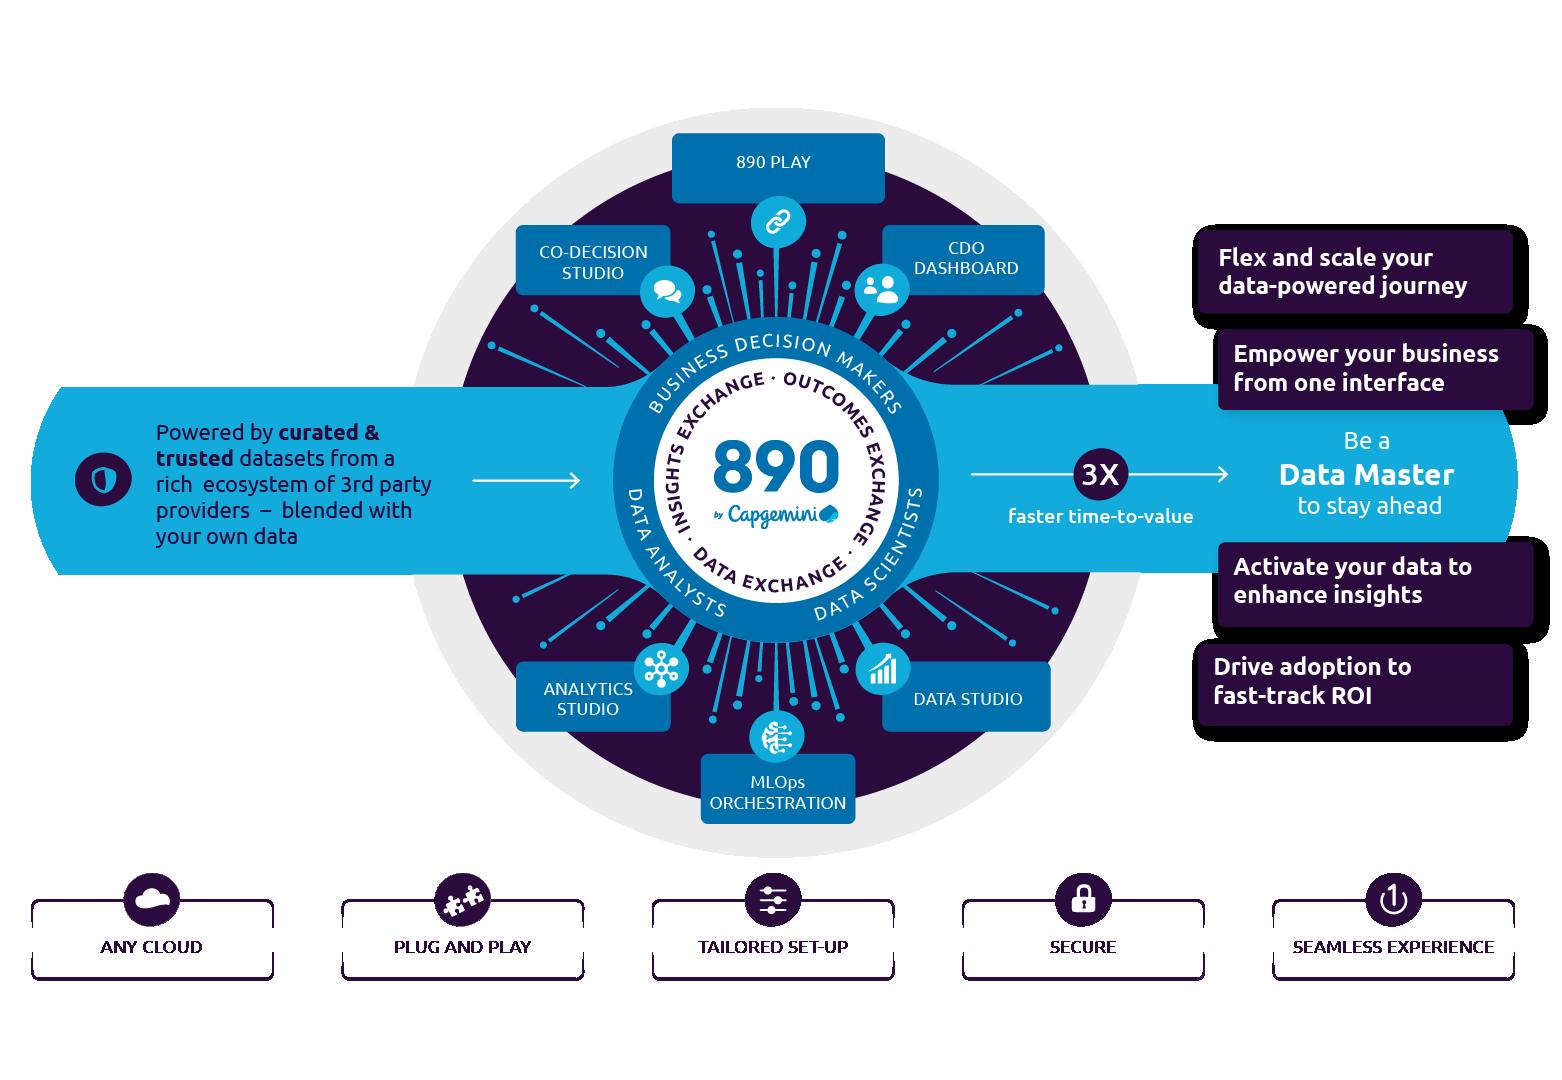 Customer Data Analytics Platform for Business Decision Making - 890 by Capgemini